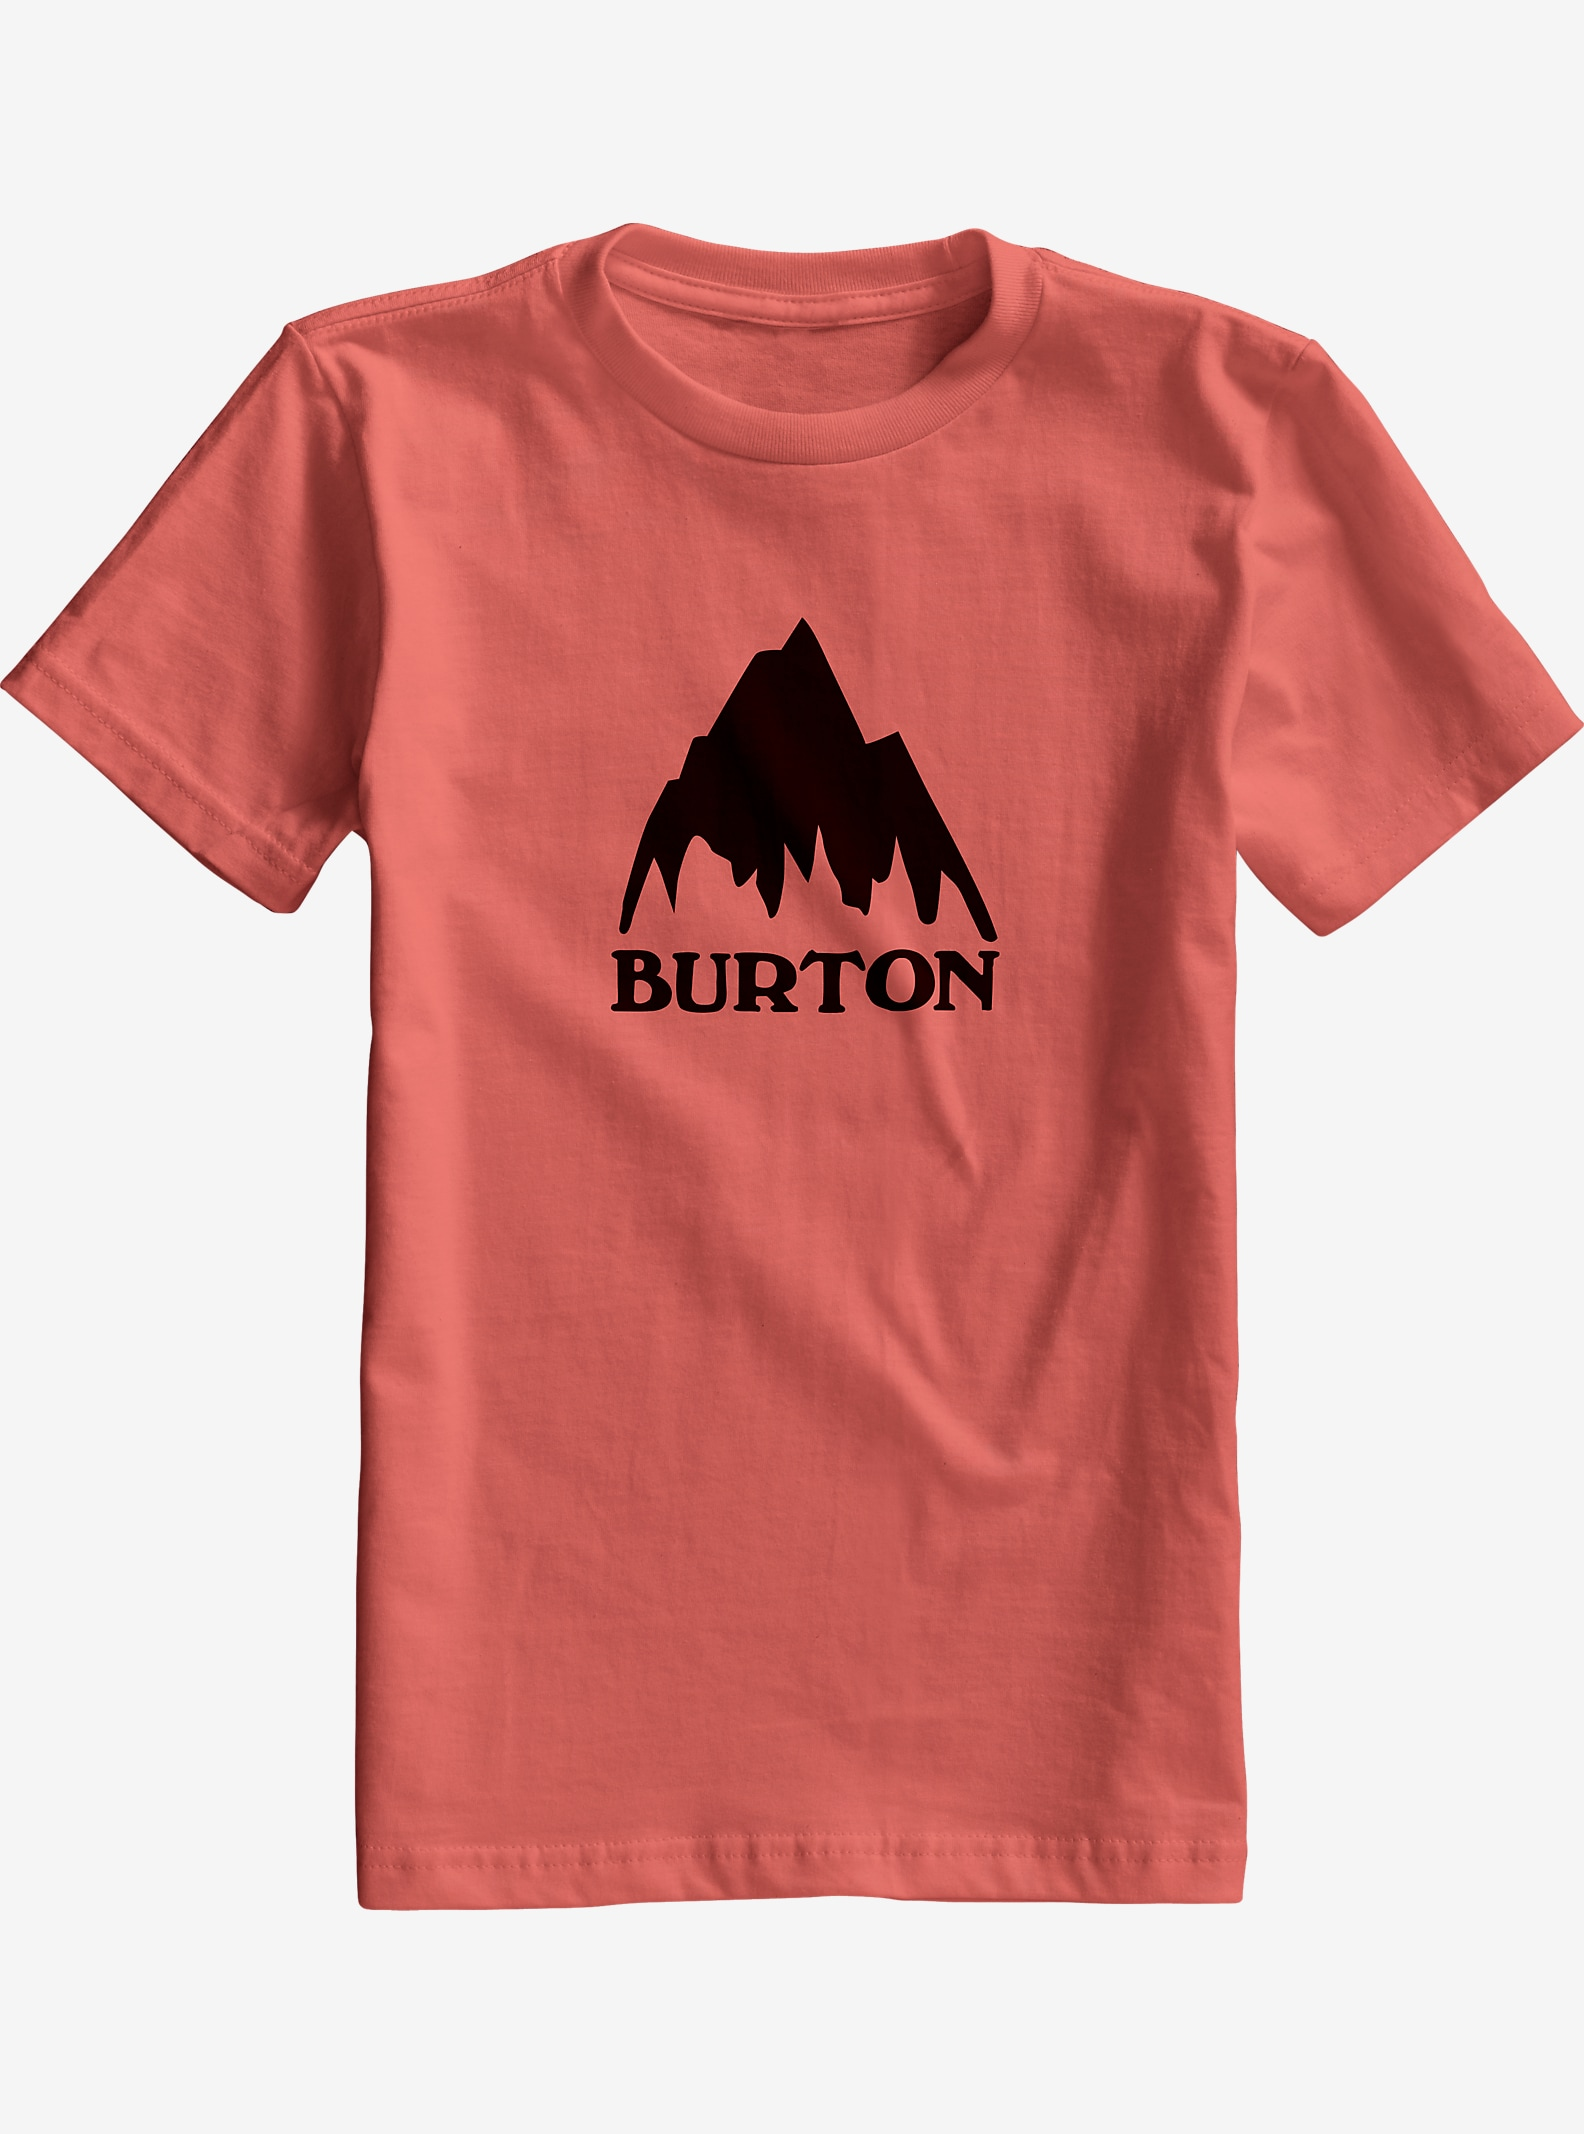 Burton Boys' Classic Mountain Short Sleeve T Shirt shown in Dusty Cedar